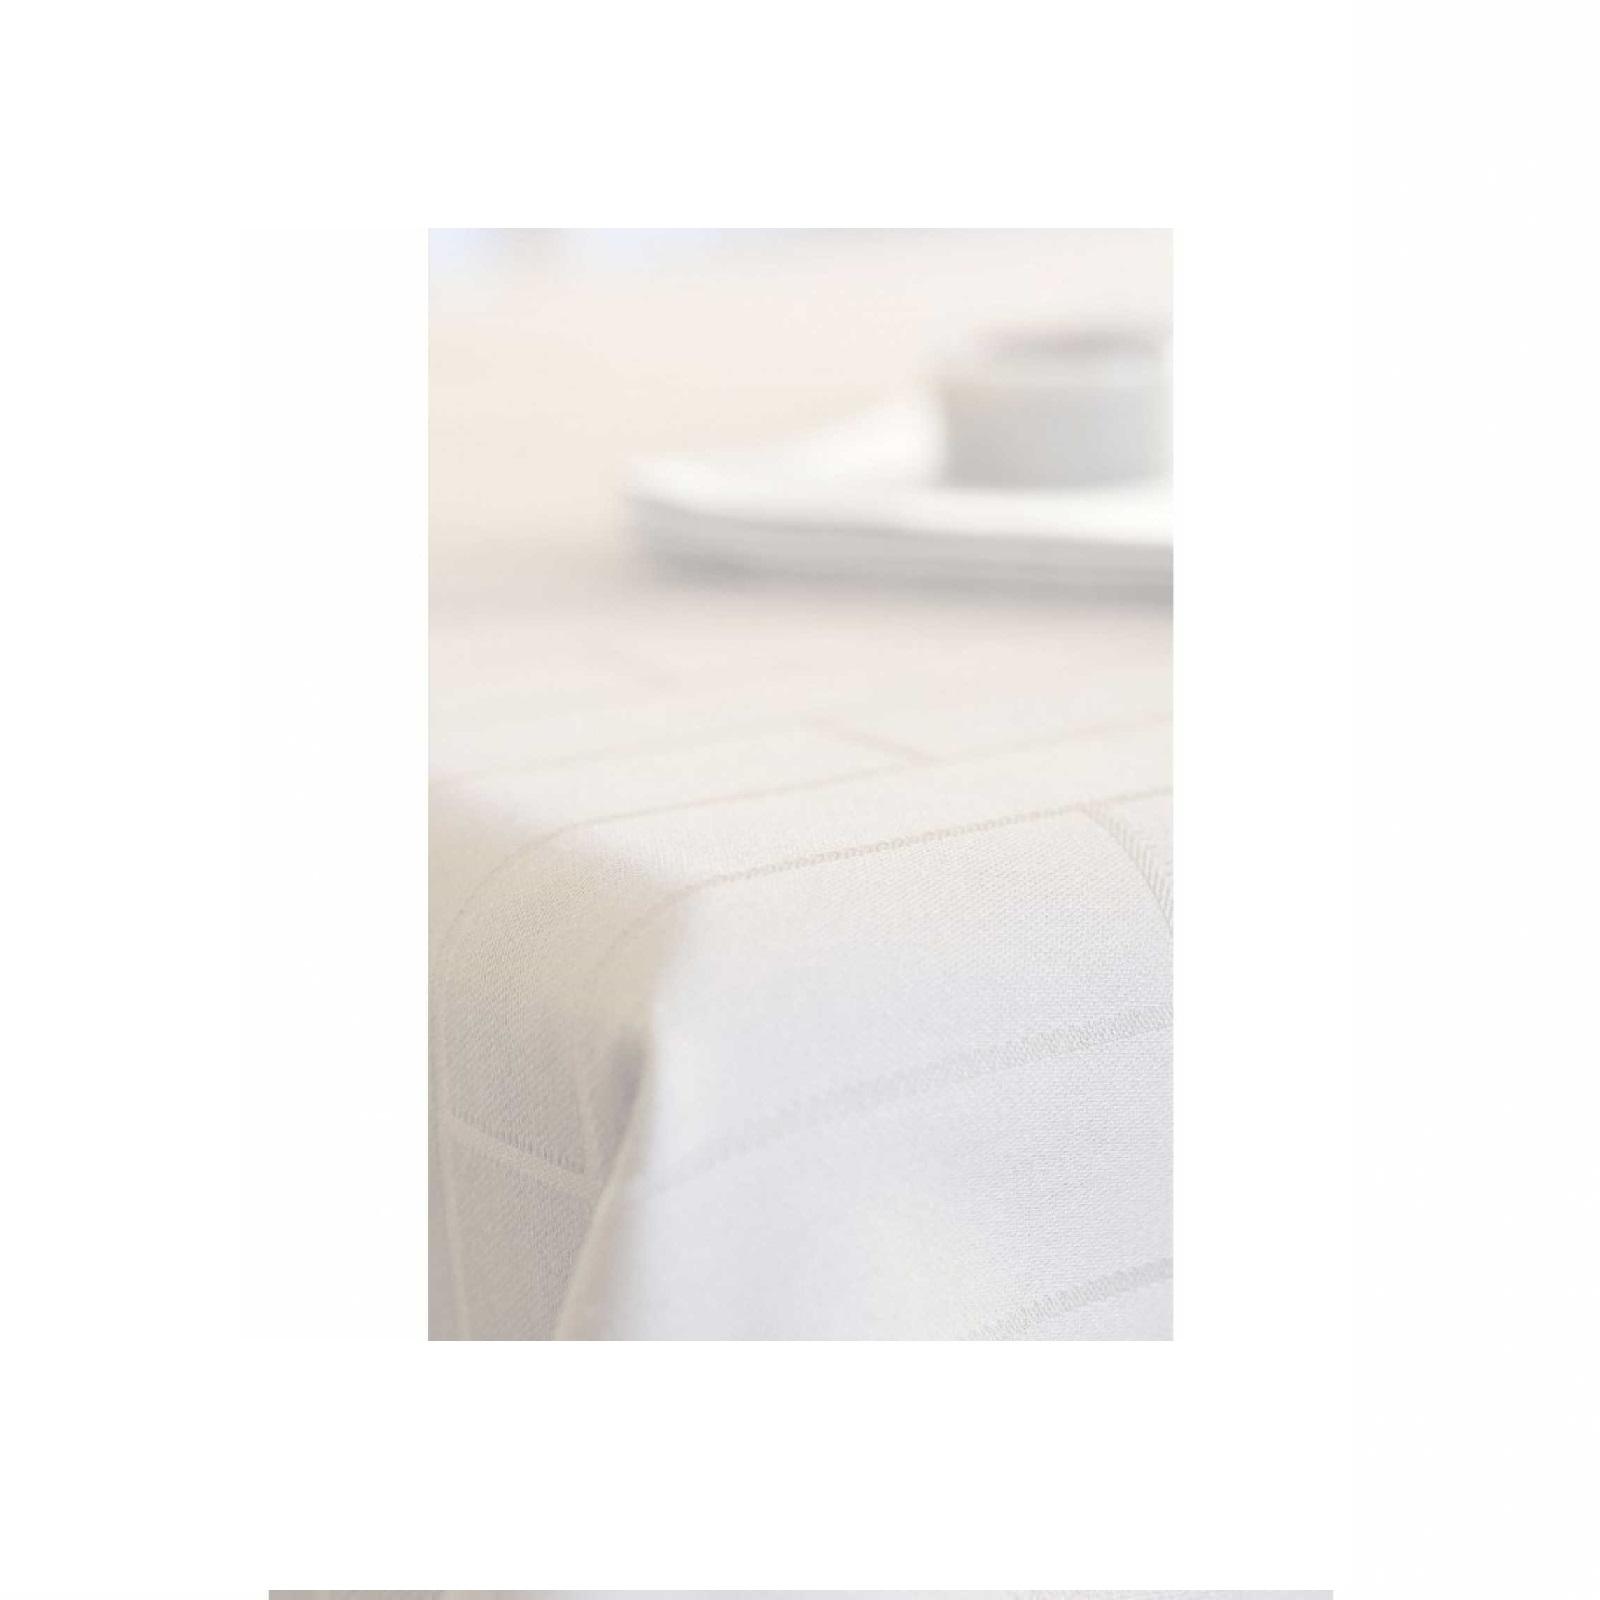 Скатерть хлопковая Winkler TECHNIQUE, 170х250 см, белый Winkler 7986010000 фото 1